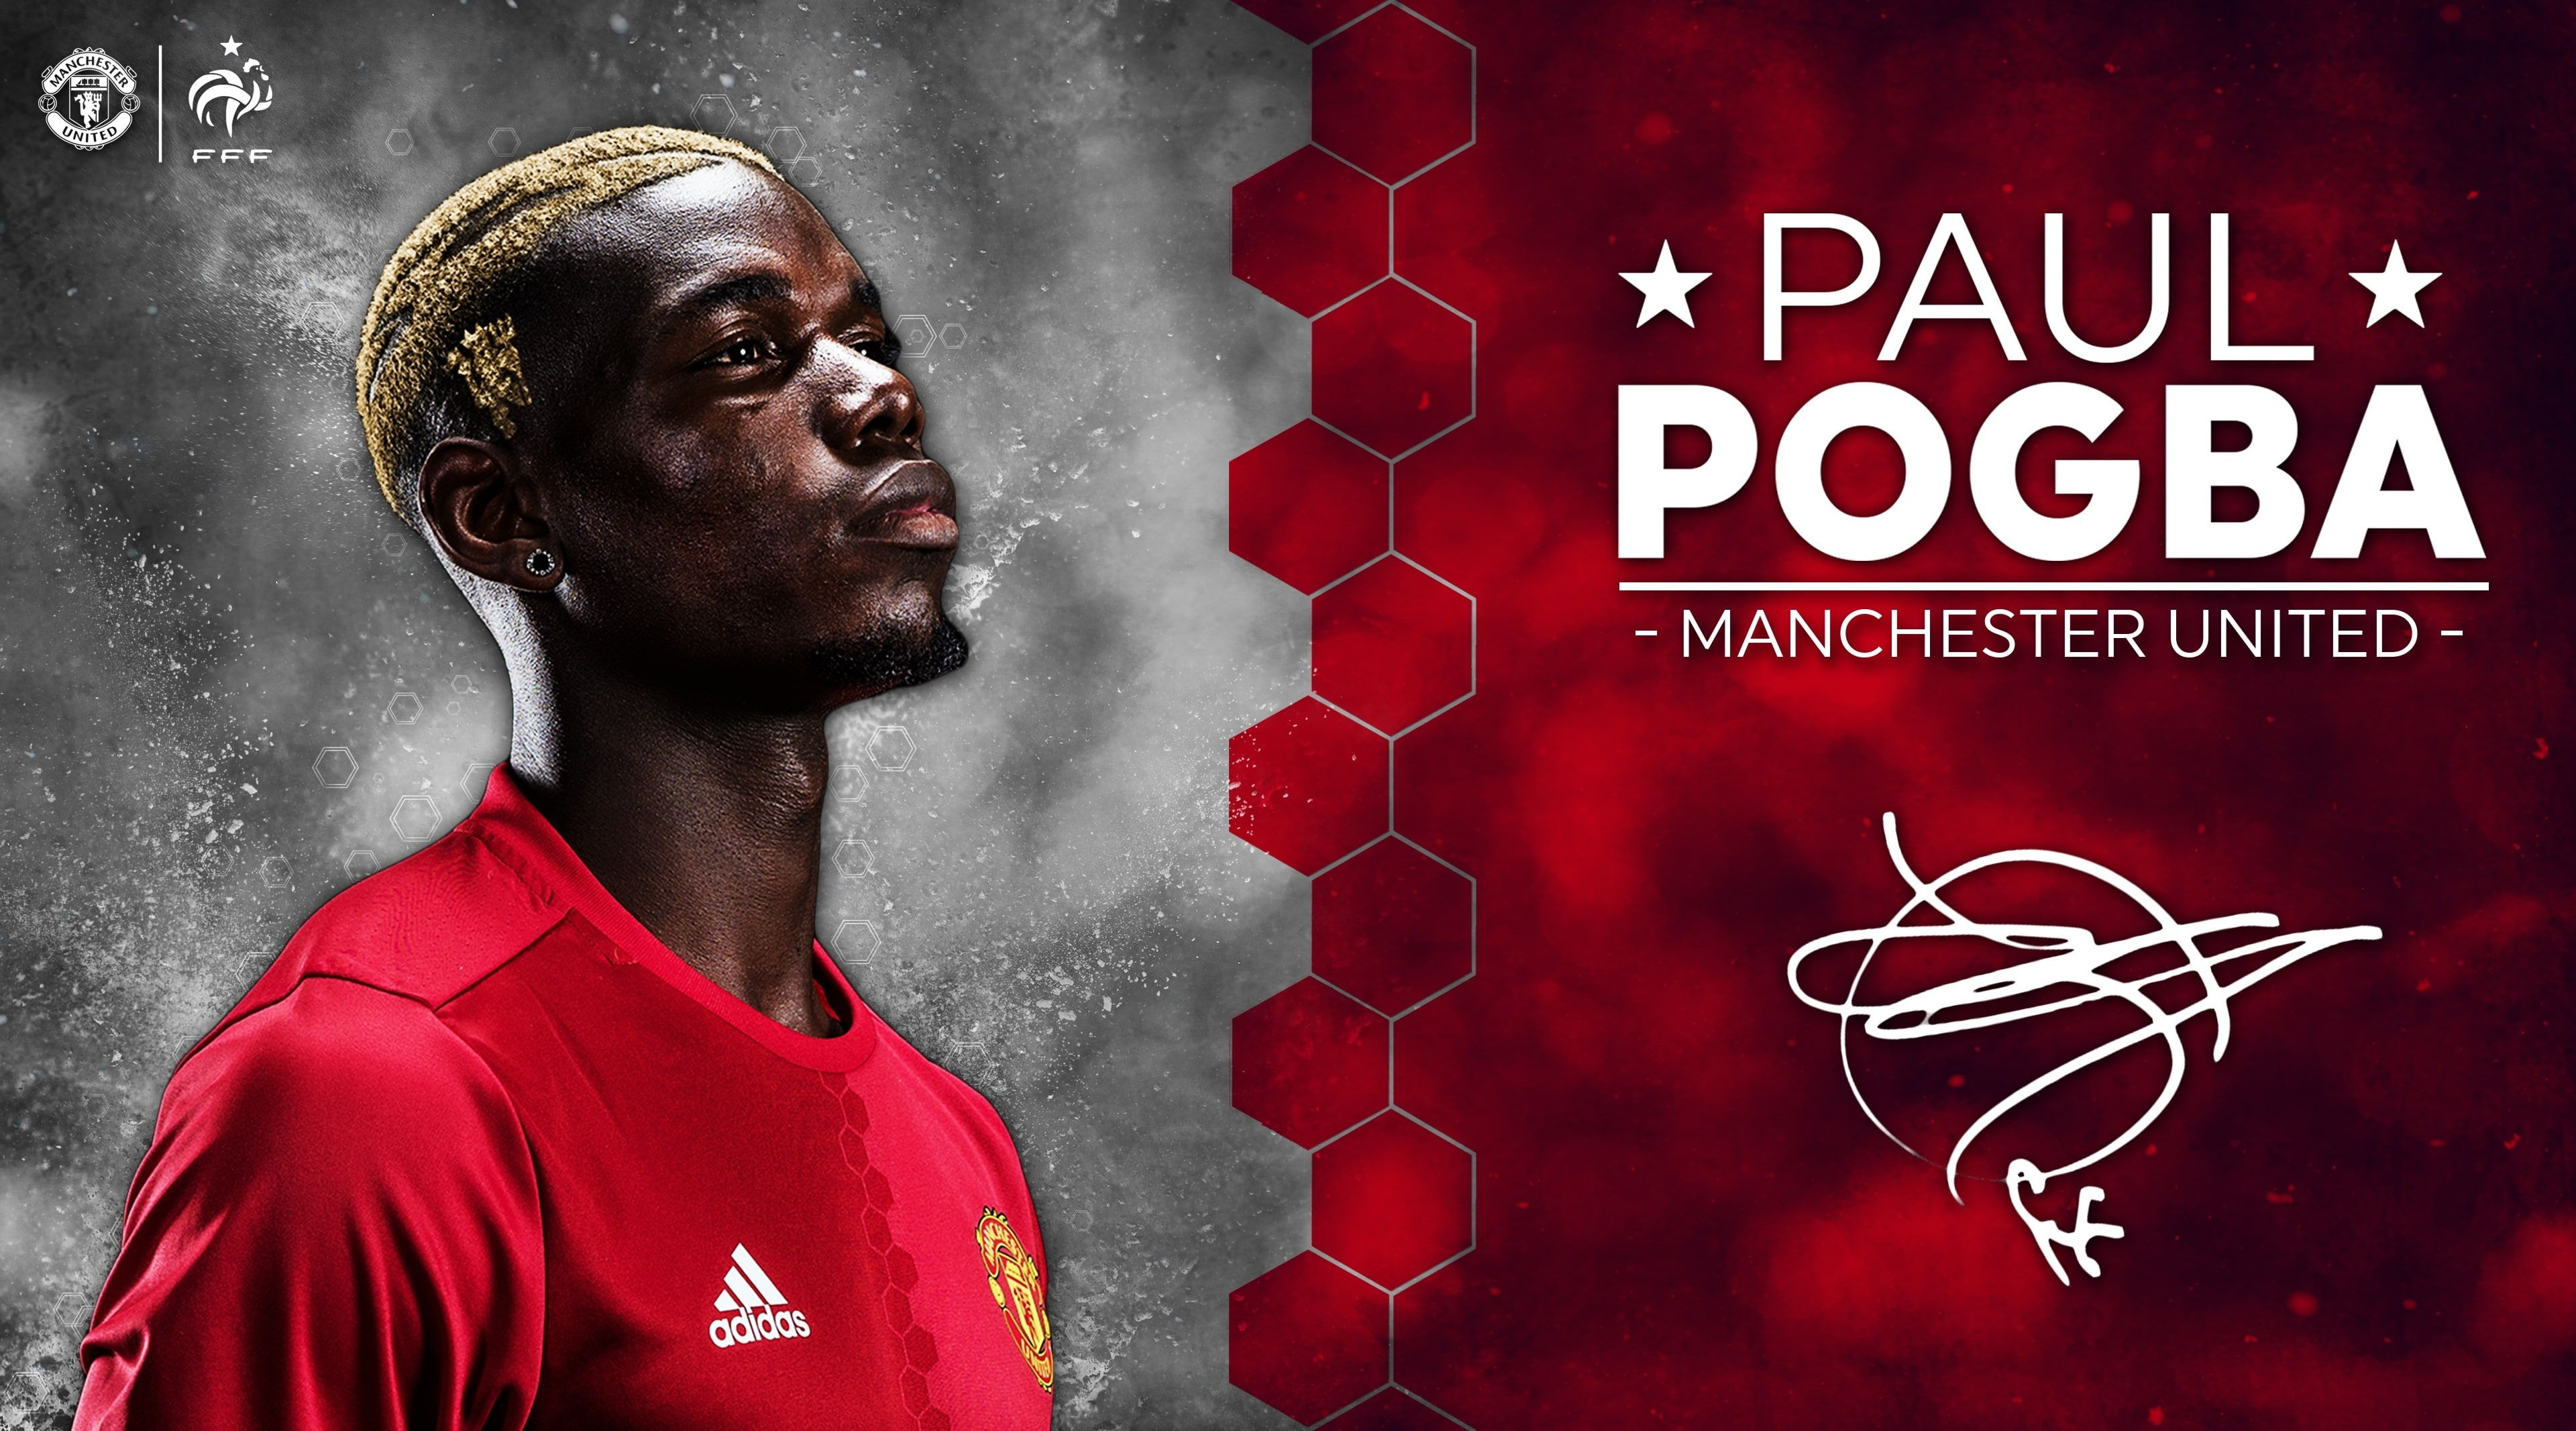 Paul Pogba Manchester United 2016 17 Paul Pogba Sports Football 4k Wallpaper Hdwallpaper Manchester United Paul Pogba Manchester United Pogba Manchester